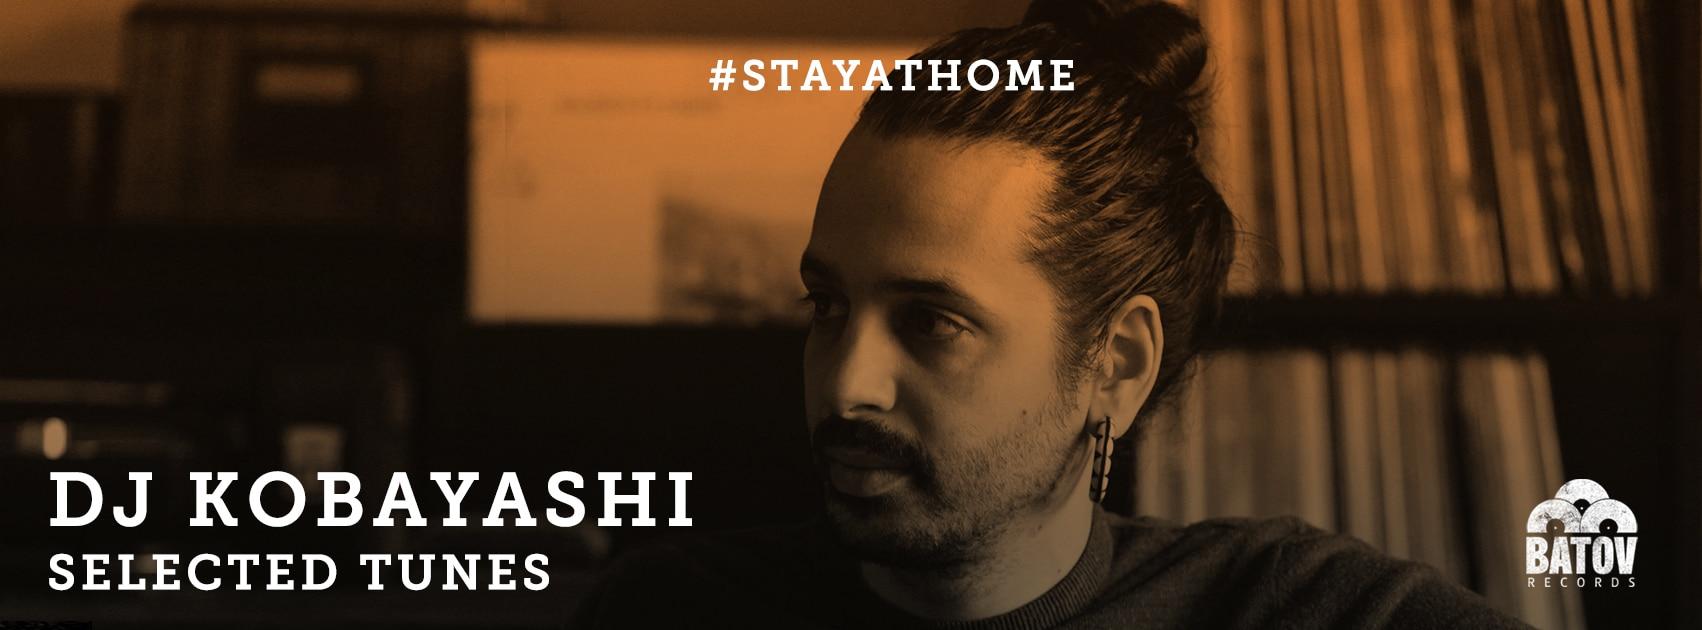 stayathome-Kobayashi banner